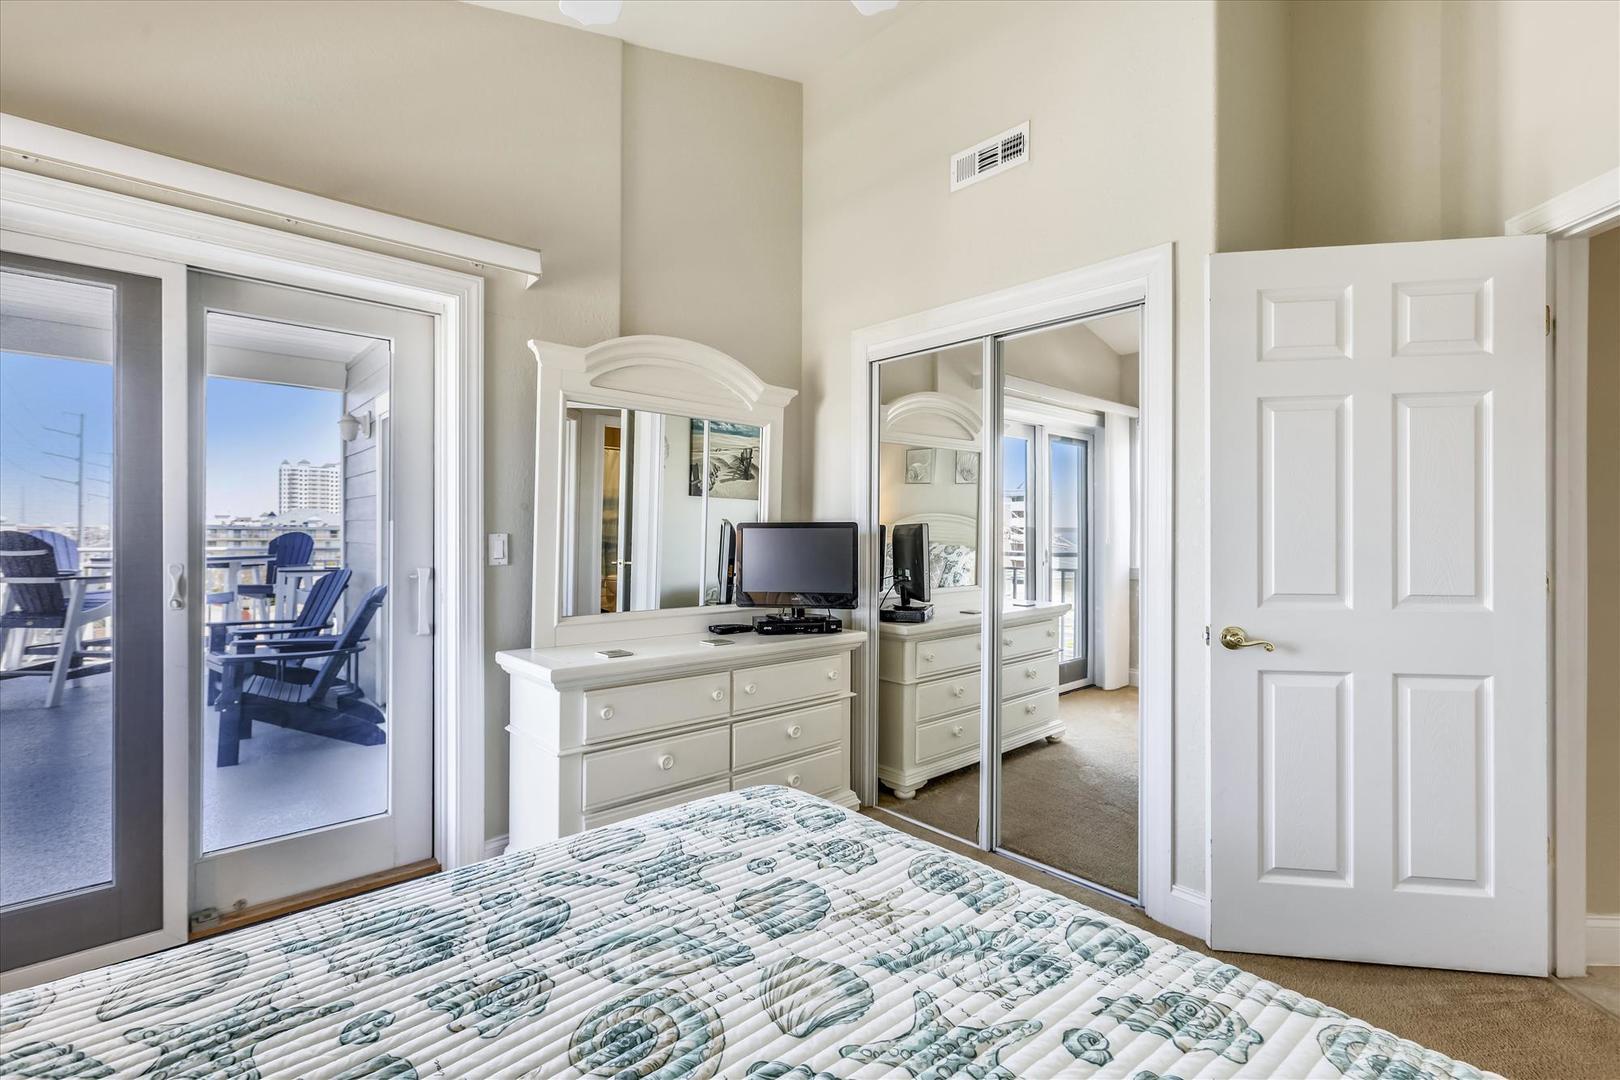 4100 Oceanside Condos 405 - Bedroom 2